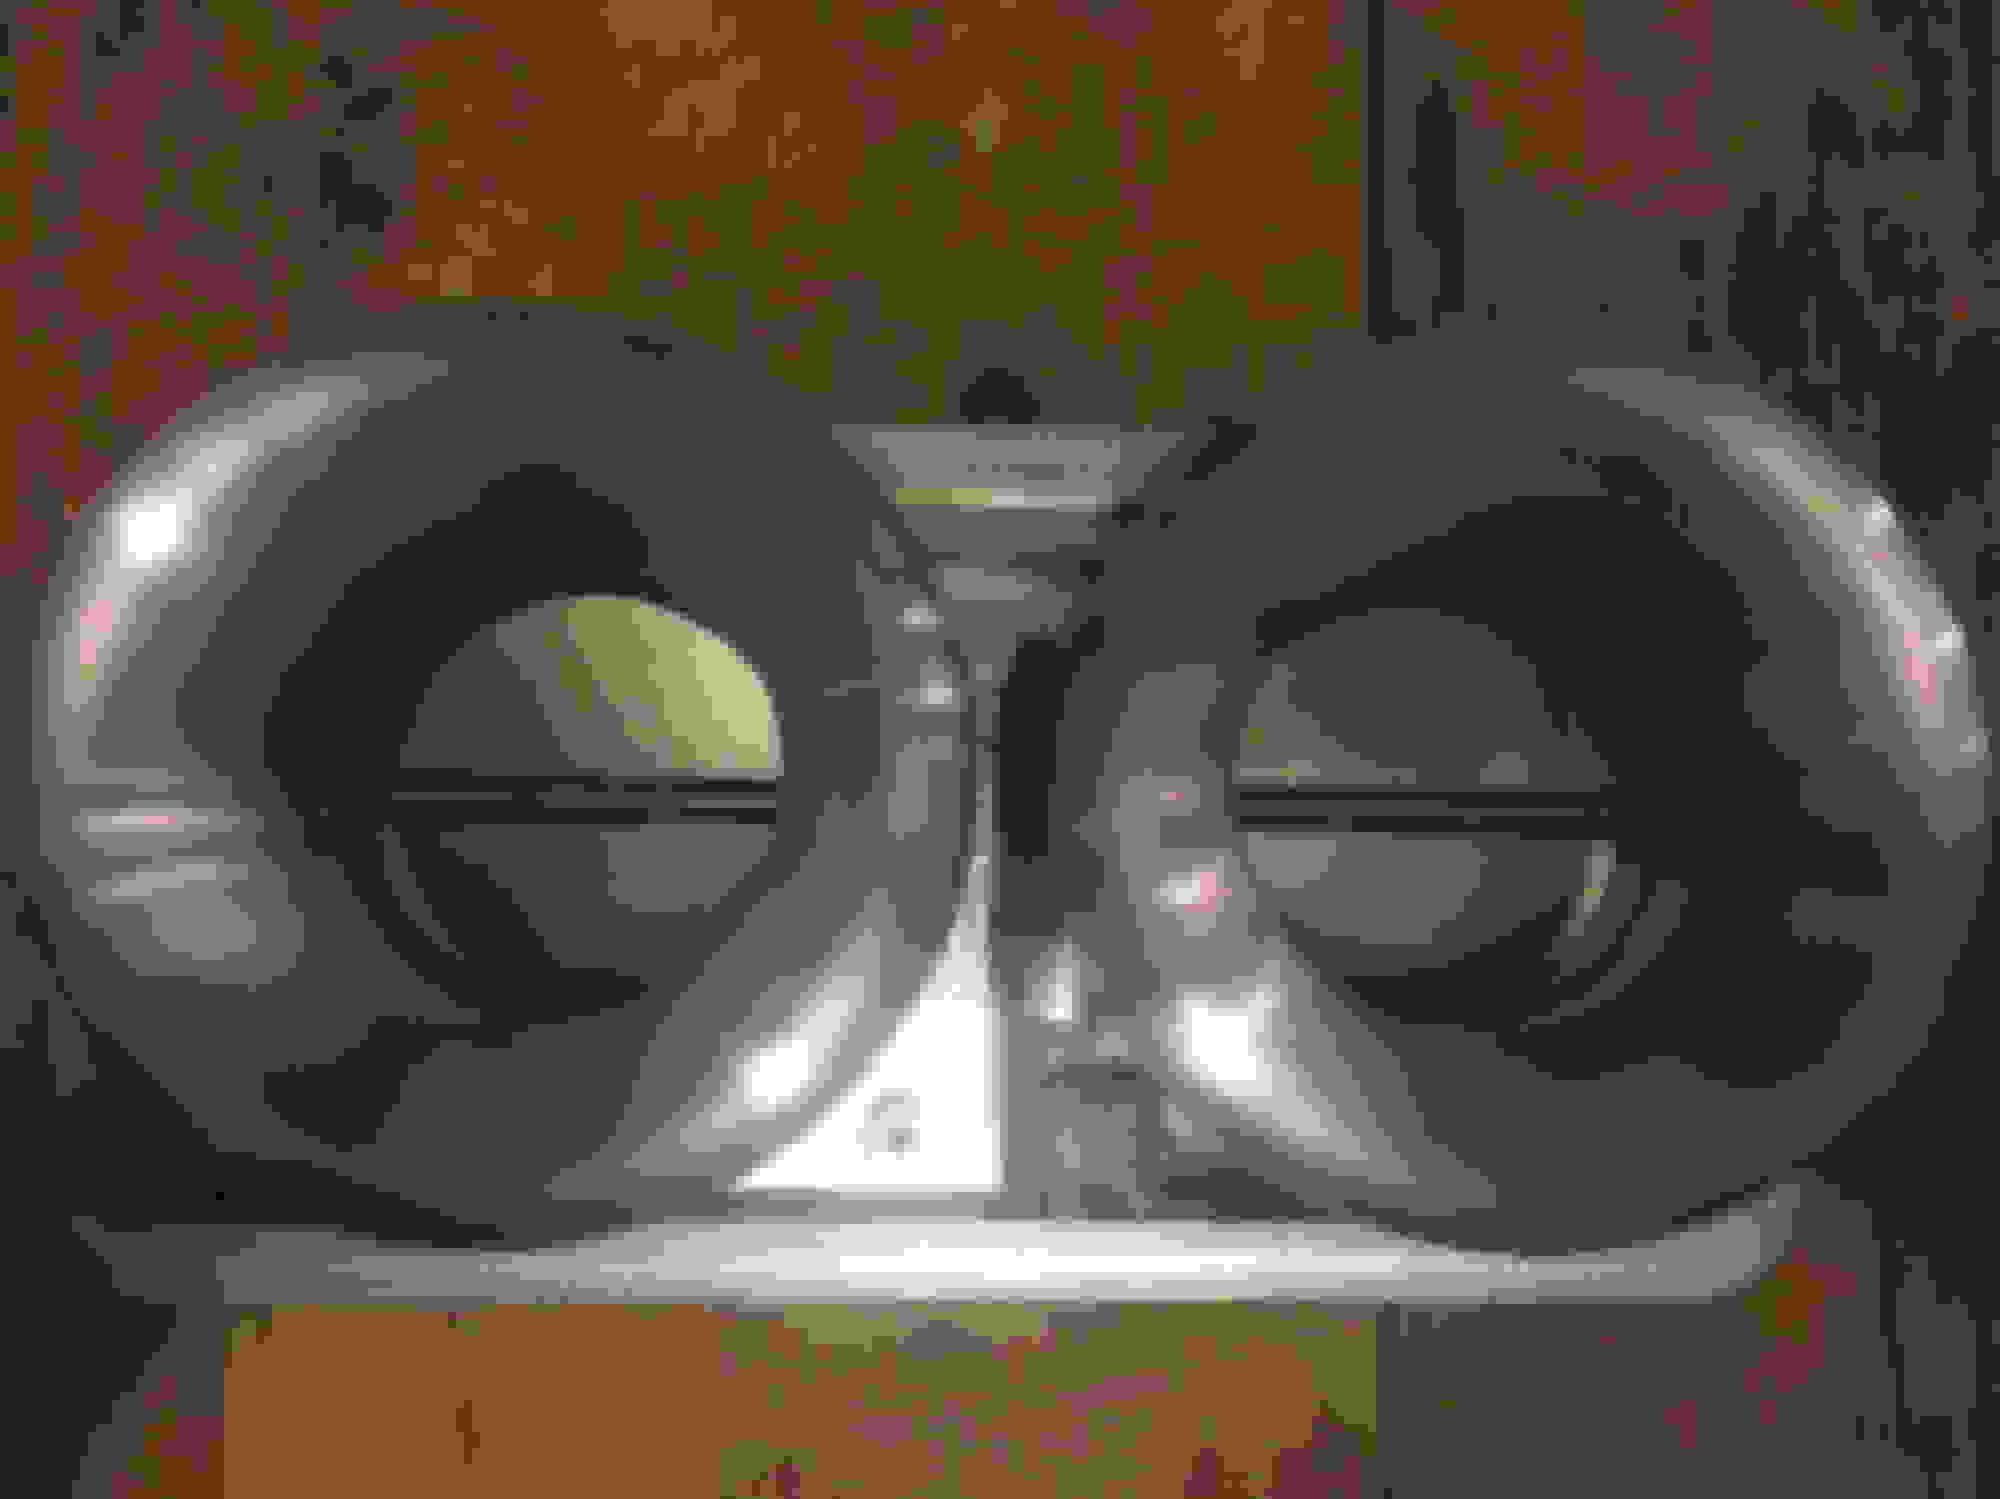 Bigger Throttle Bodies, Please Comment - Page 7 - MBWorld